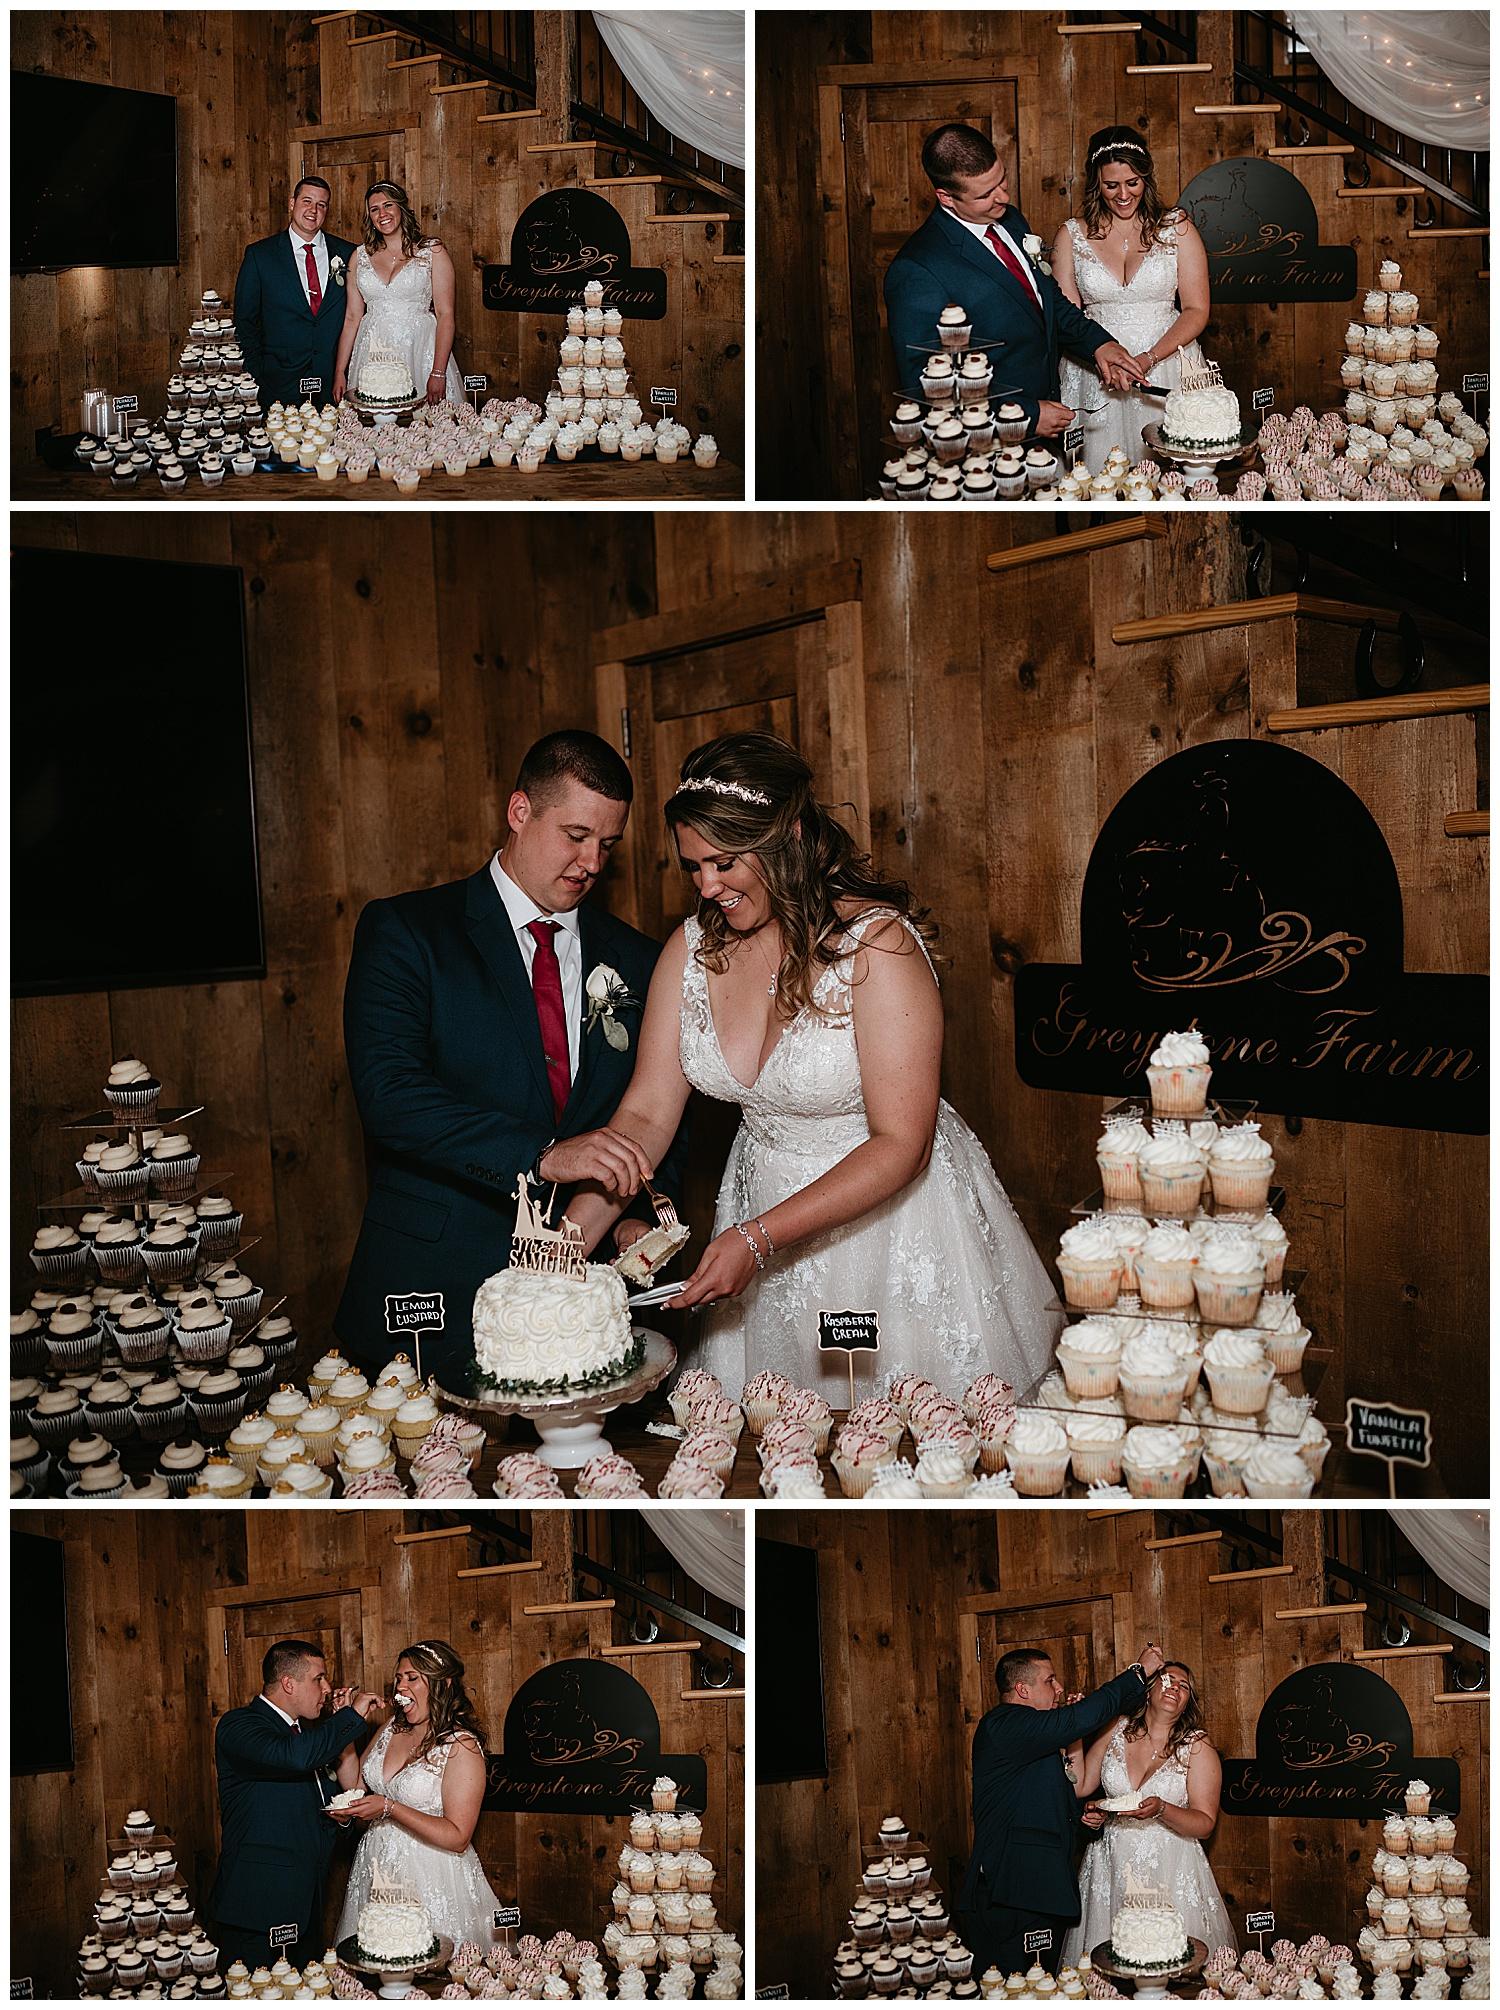 NEPA-Bloomgsburg-Wedding-Photographer-at-The-Barn-at-Greystone-Farms-Watsontown-PA_0088.jpg